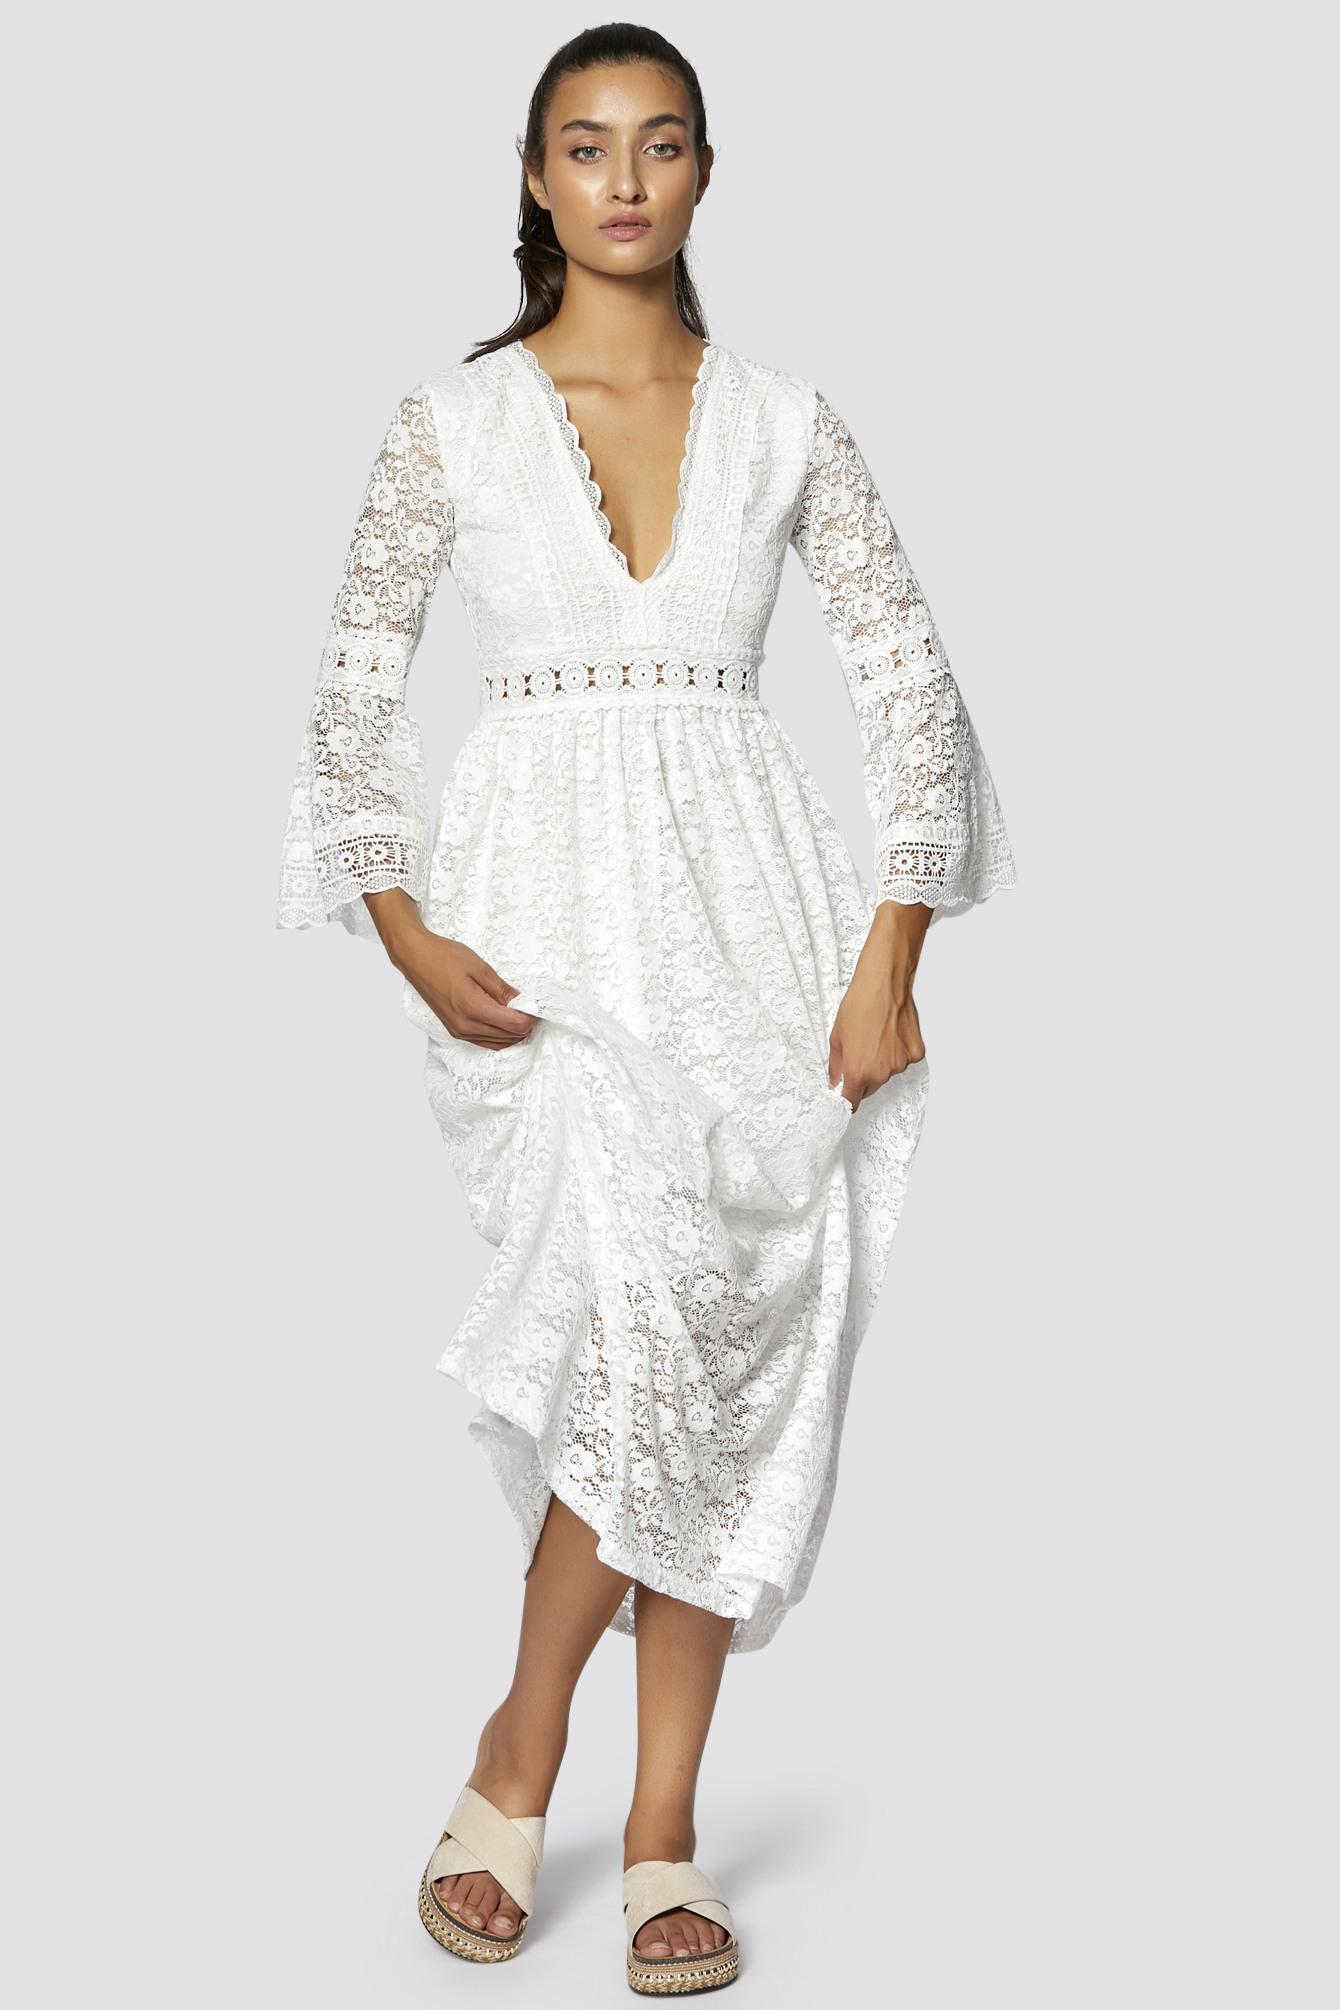 20 Wunderbar Kleid Lang Weiß Boutique Perfekt Kleid Lang Weiß Stylish